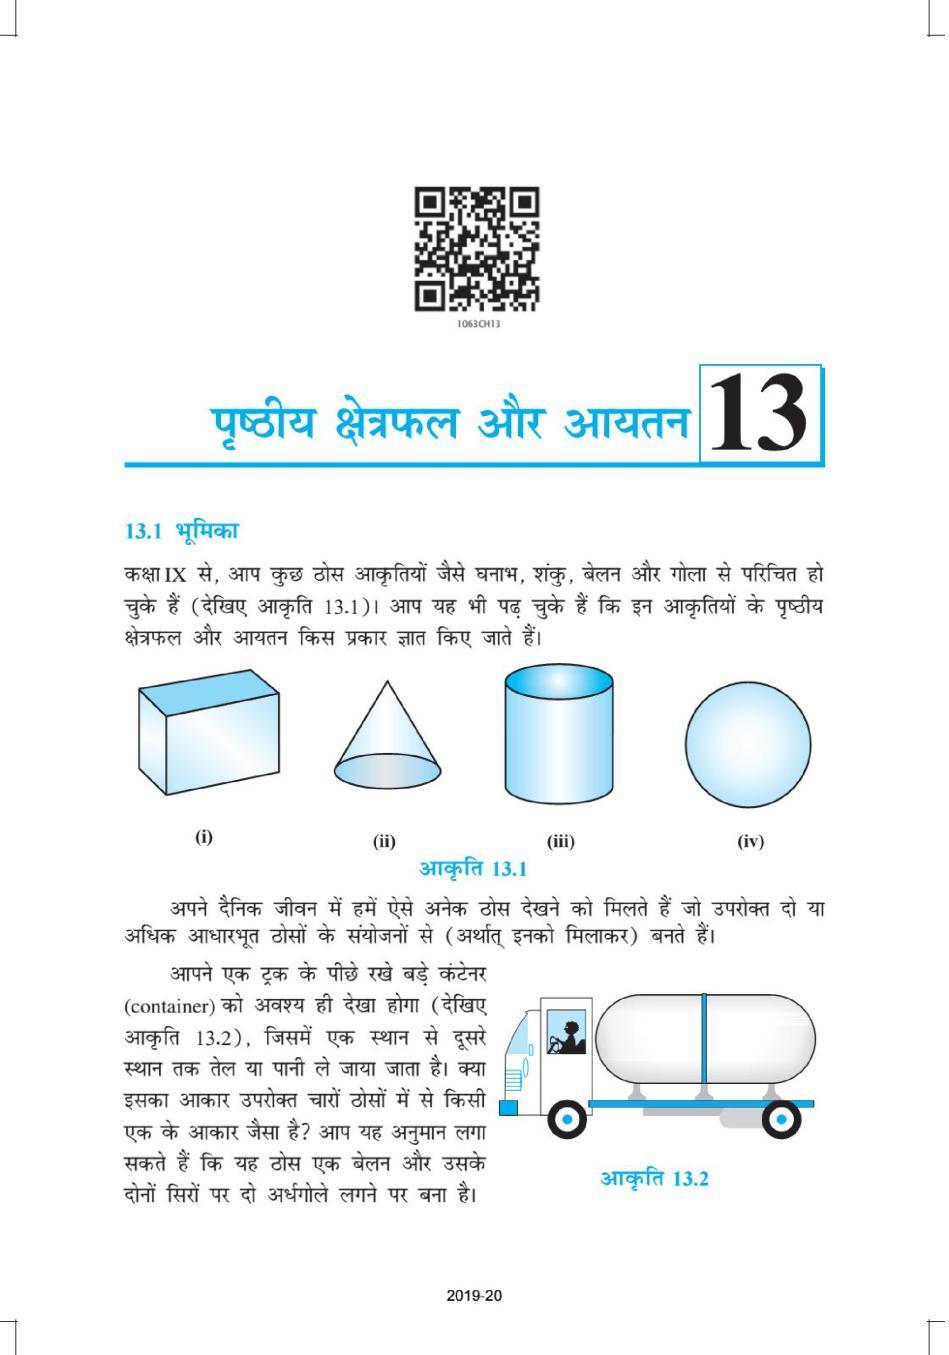 NCERT Book Class 10 Maths (गणित) Chapter 13 पृष्ठीय क्षेत्रफल और आयतन - Page 1